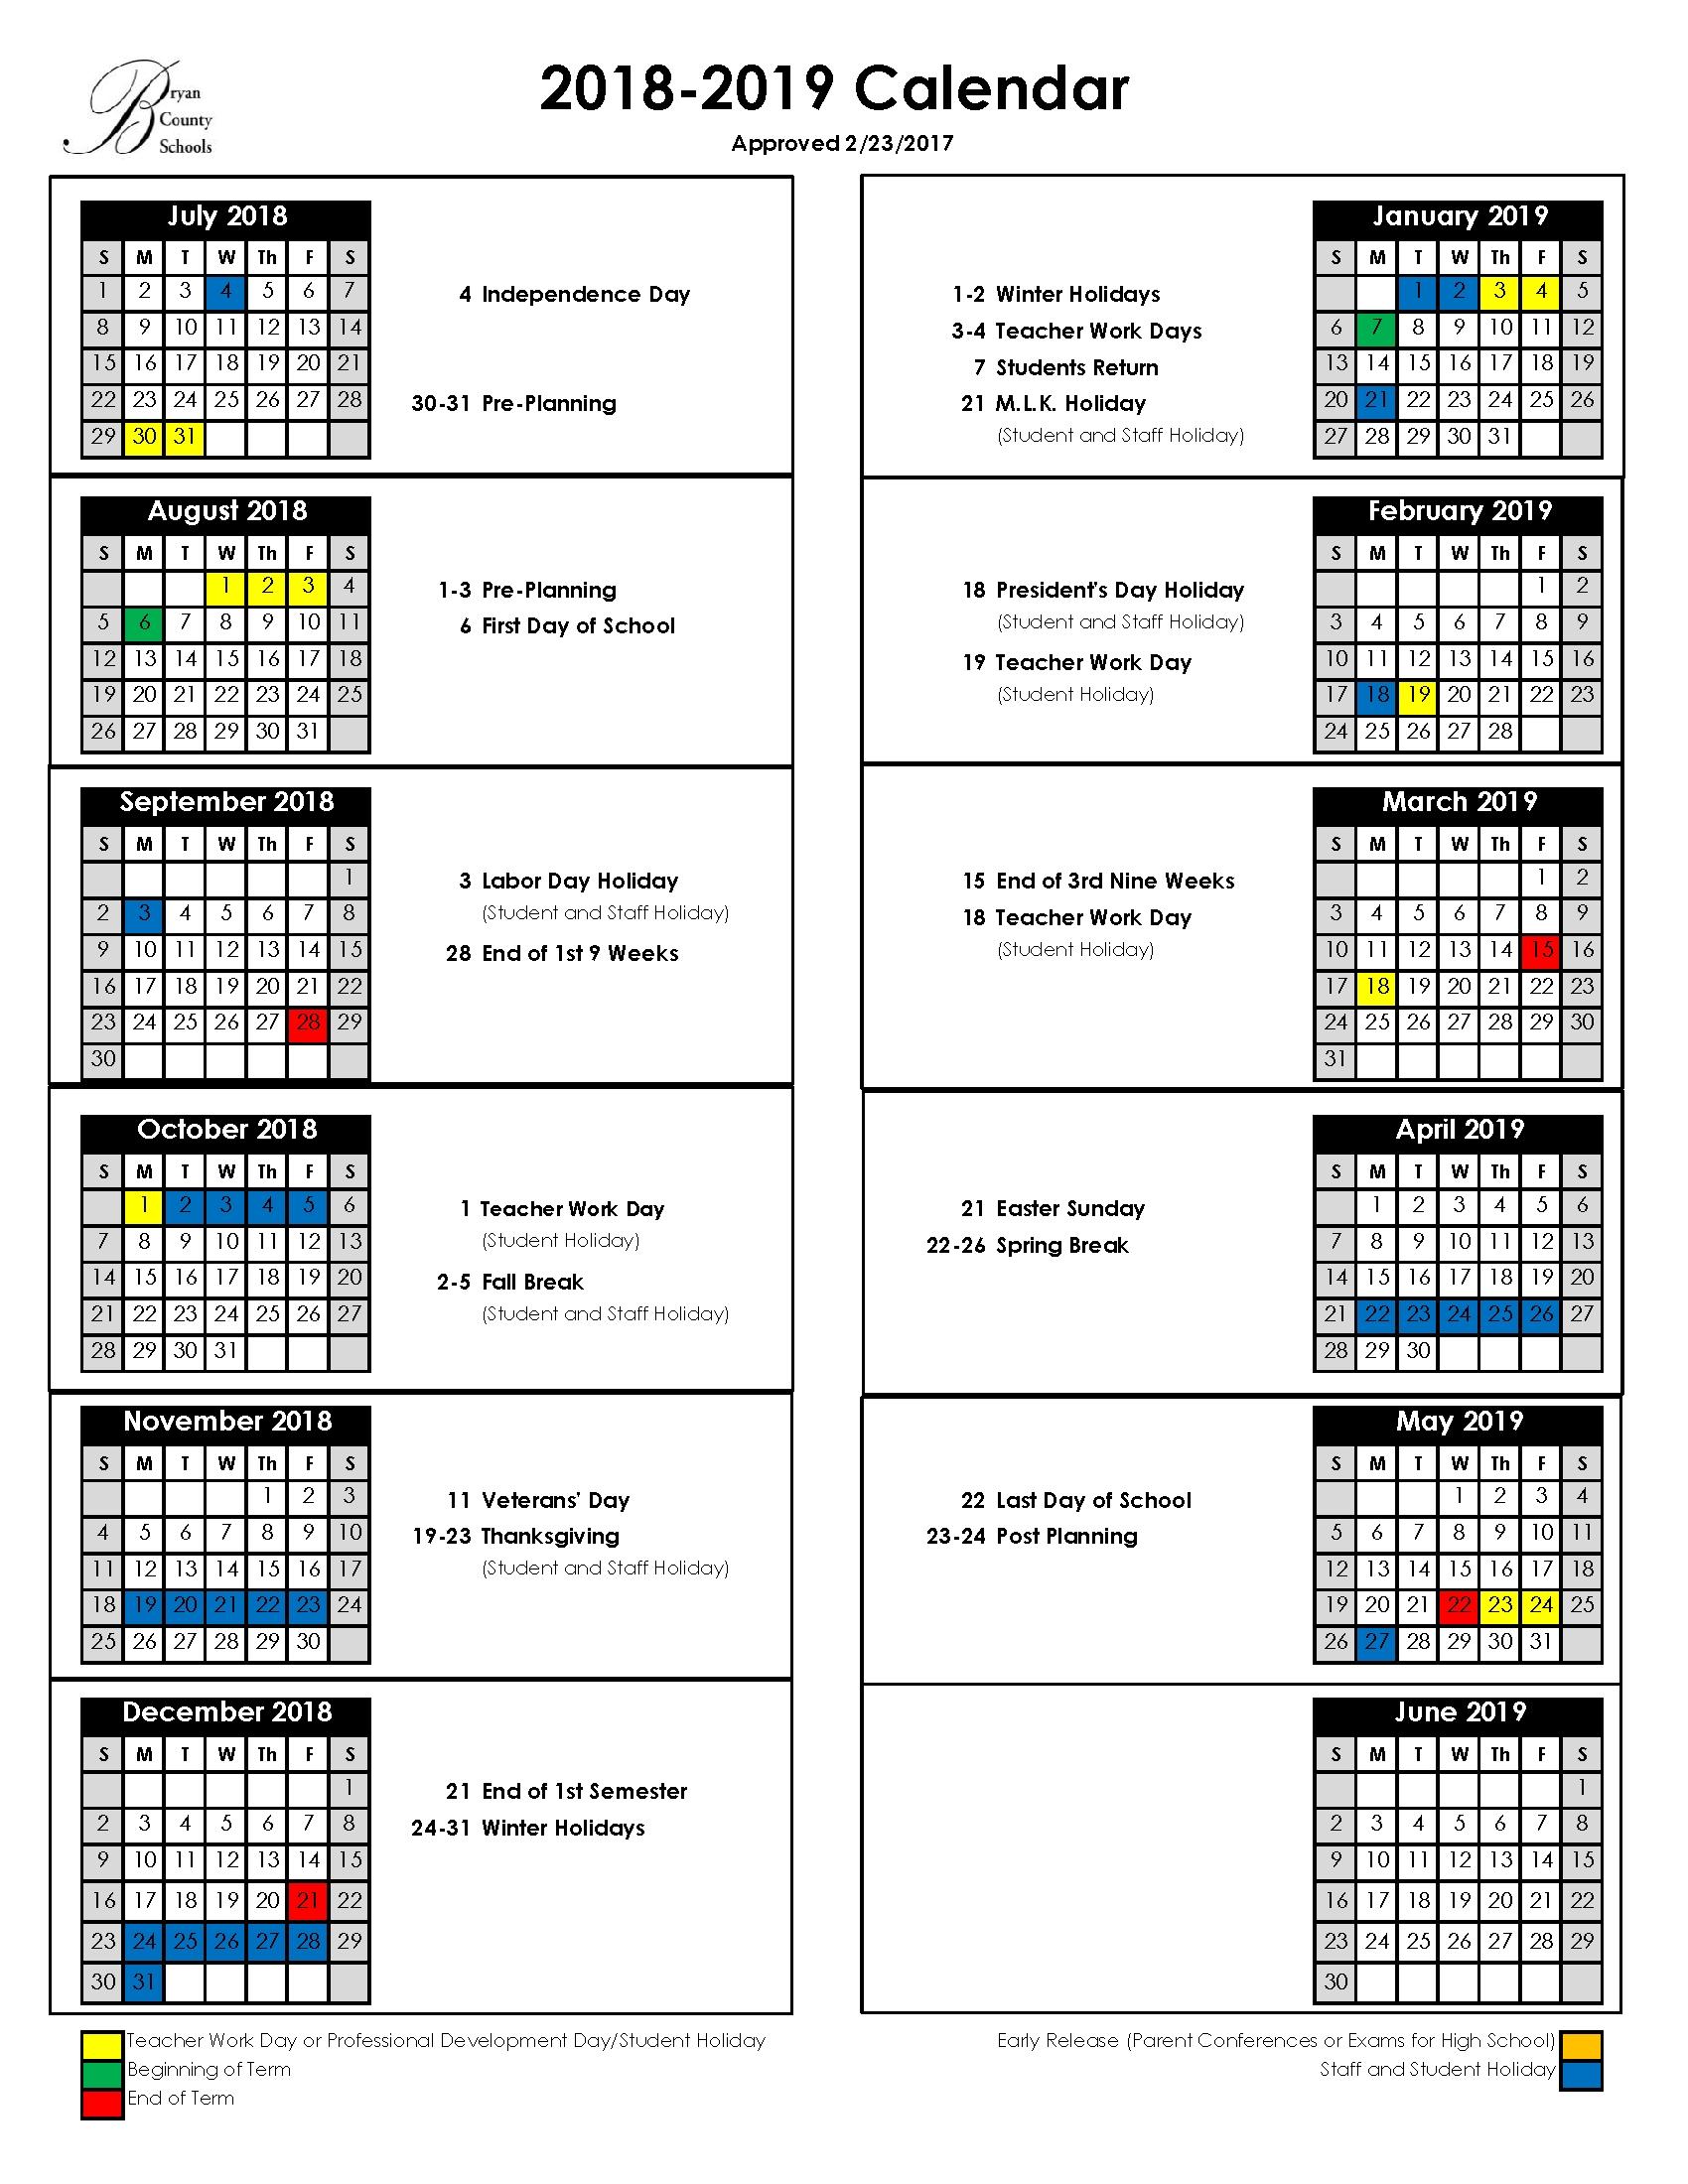 Bryan County Schools School Calendar 2019 20